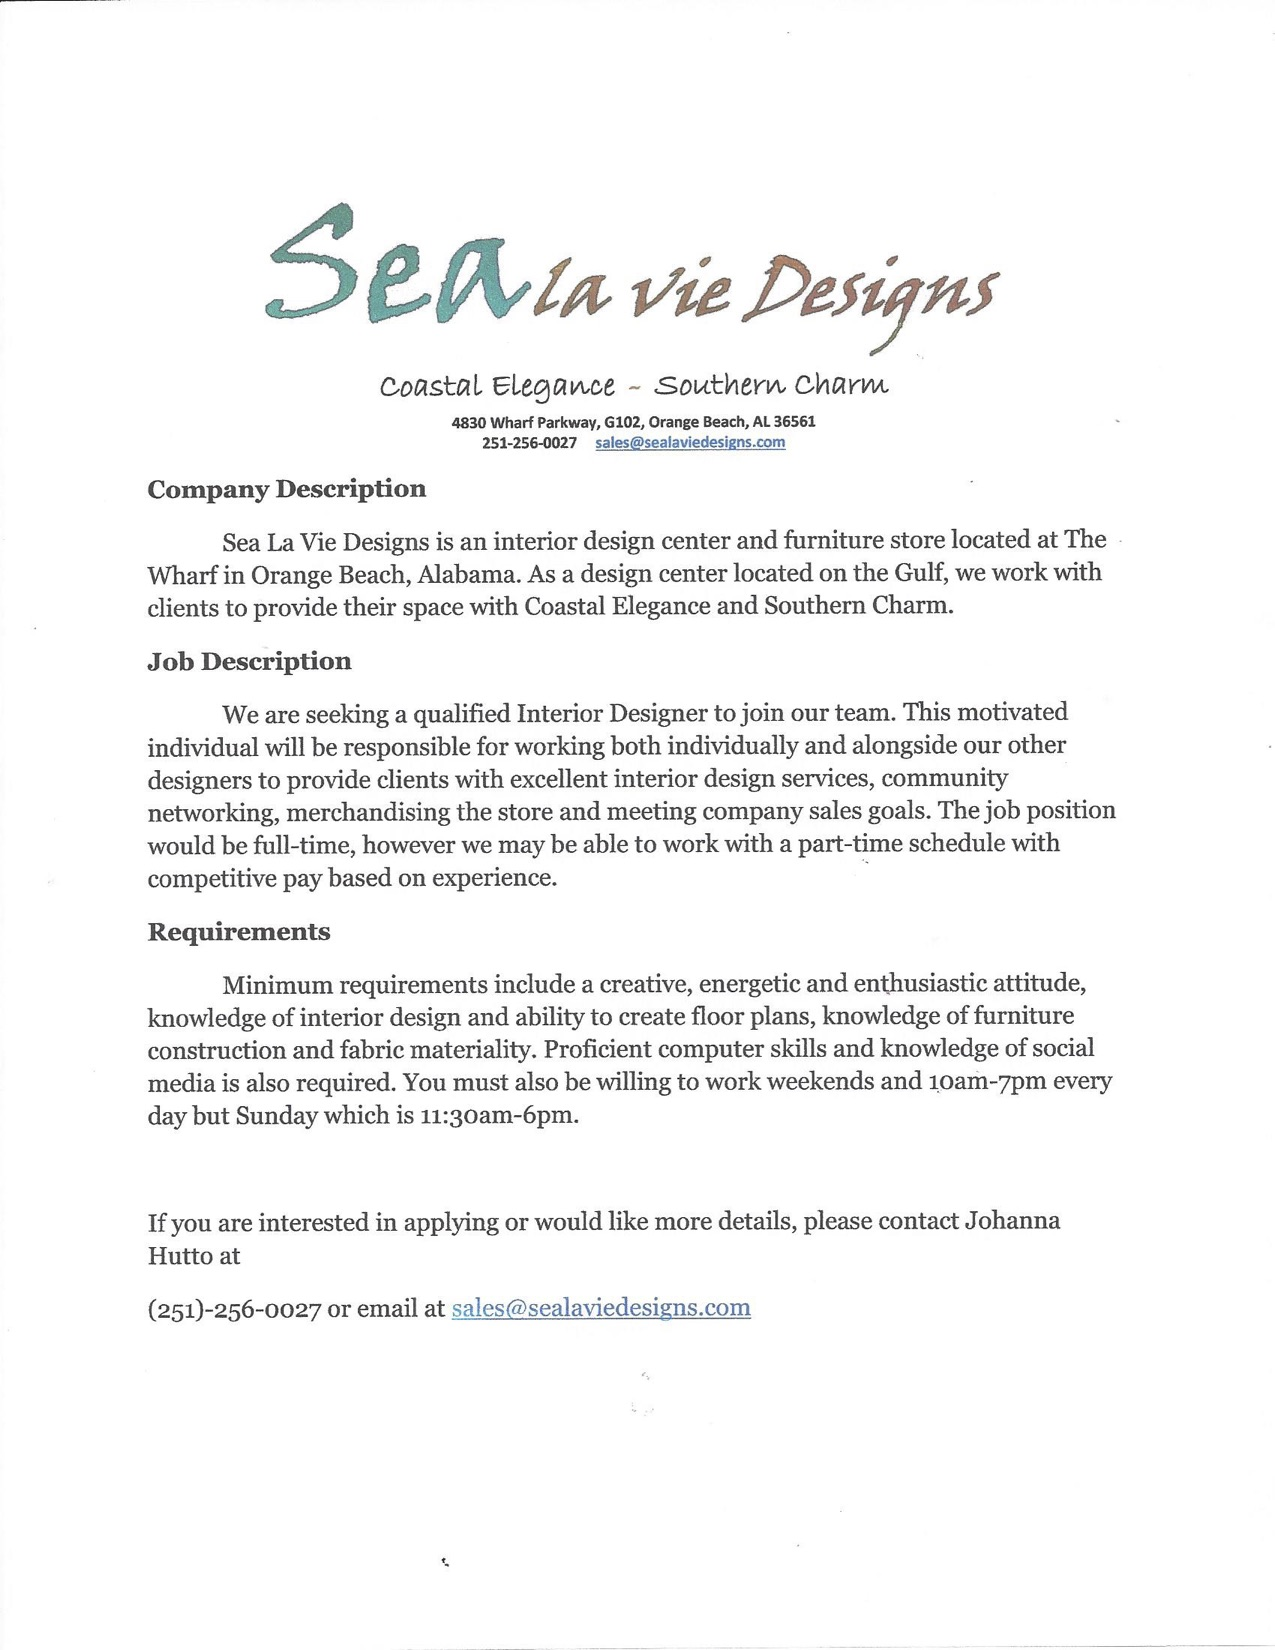 Sea La Vie Designs At The Wharf In Orange Beach Alabama An Interior Designer Position